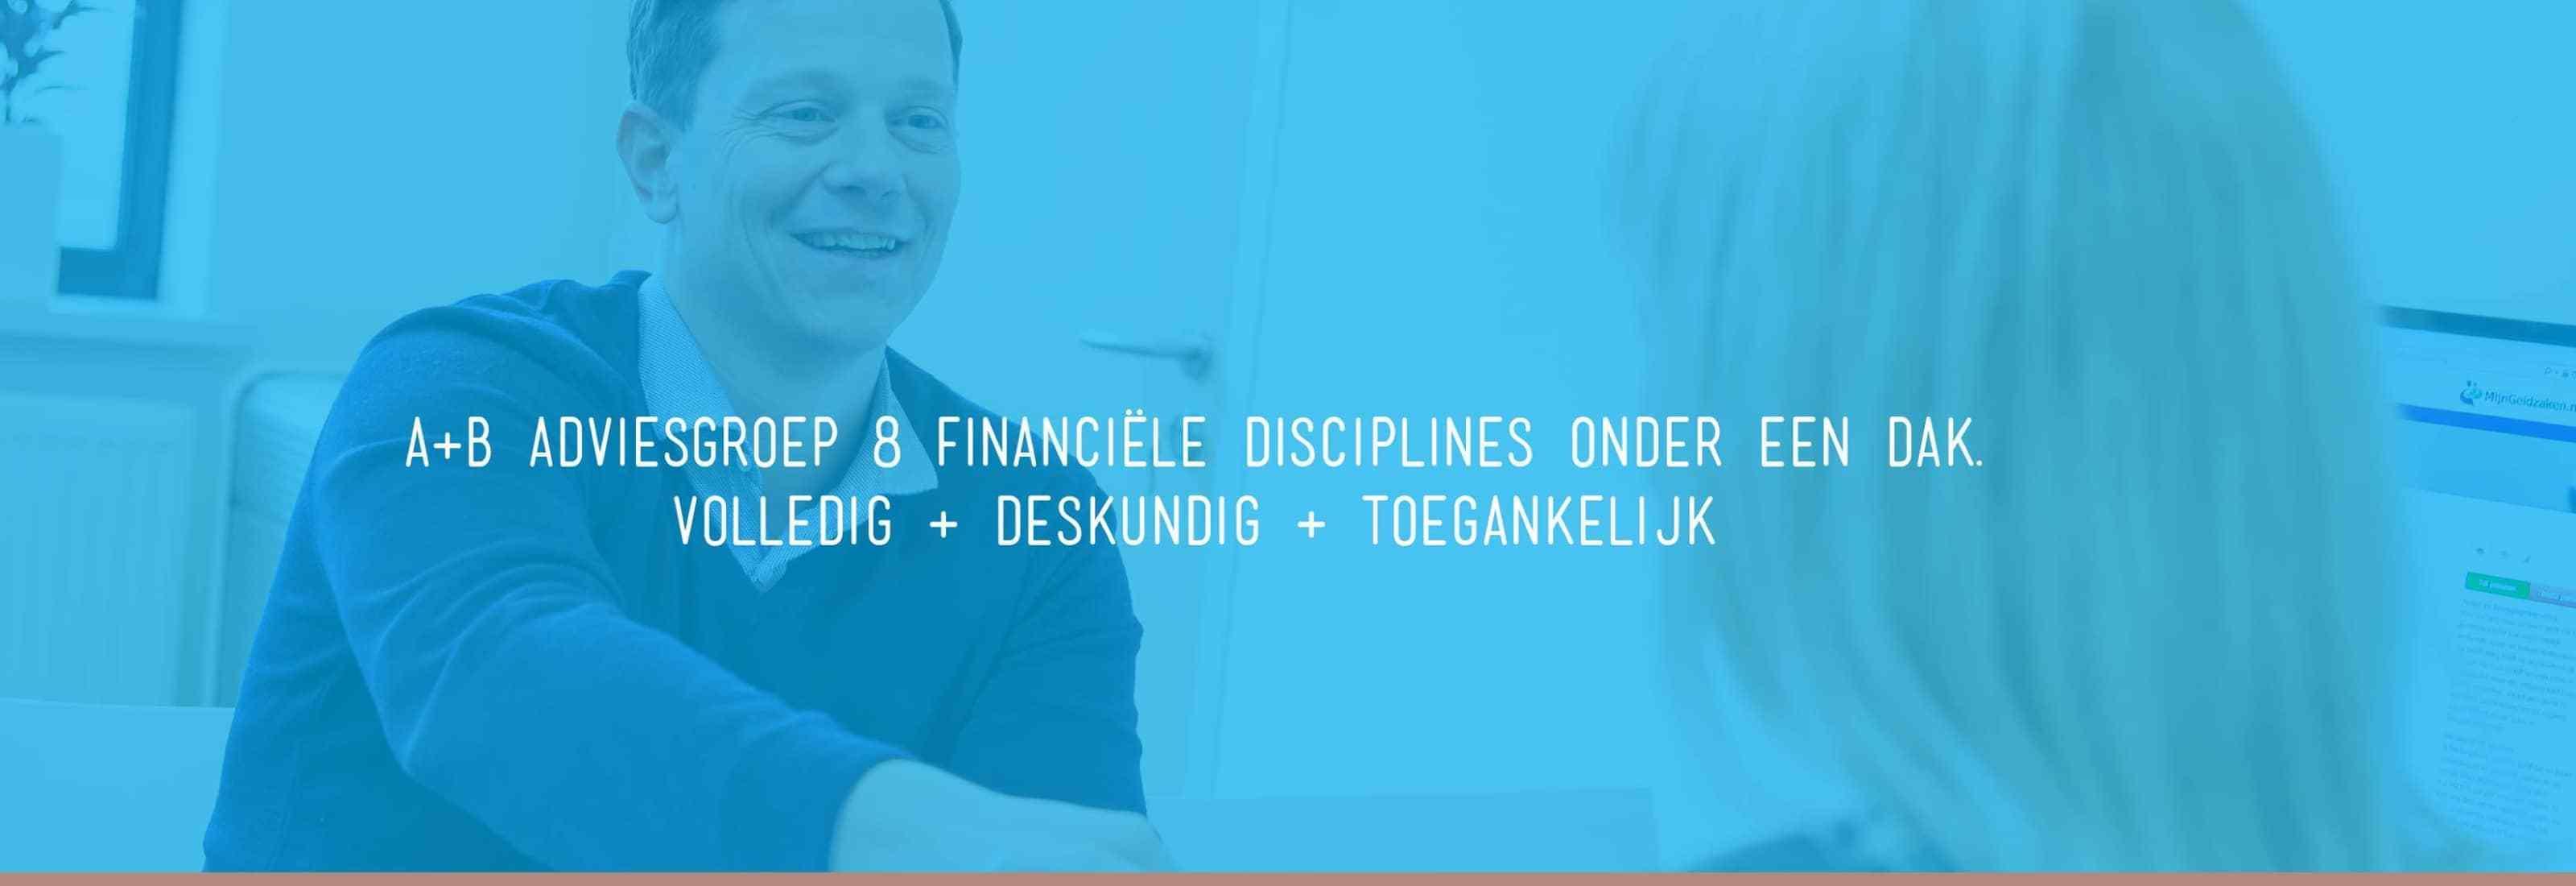 A+B Adviesgroep - Advies / administratie / belastingadvieskantoor in Nijkerk